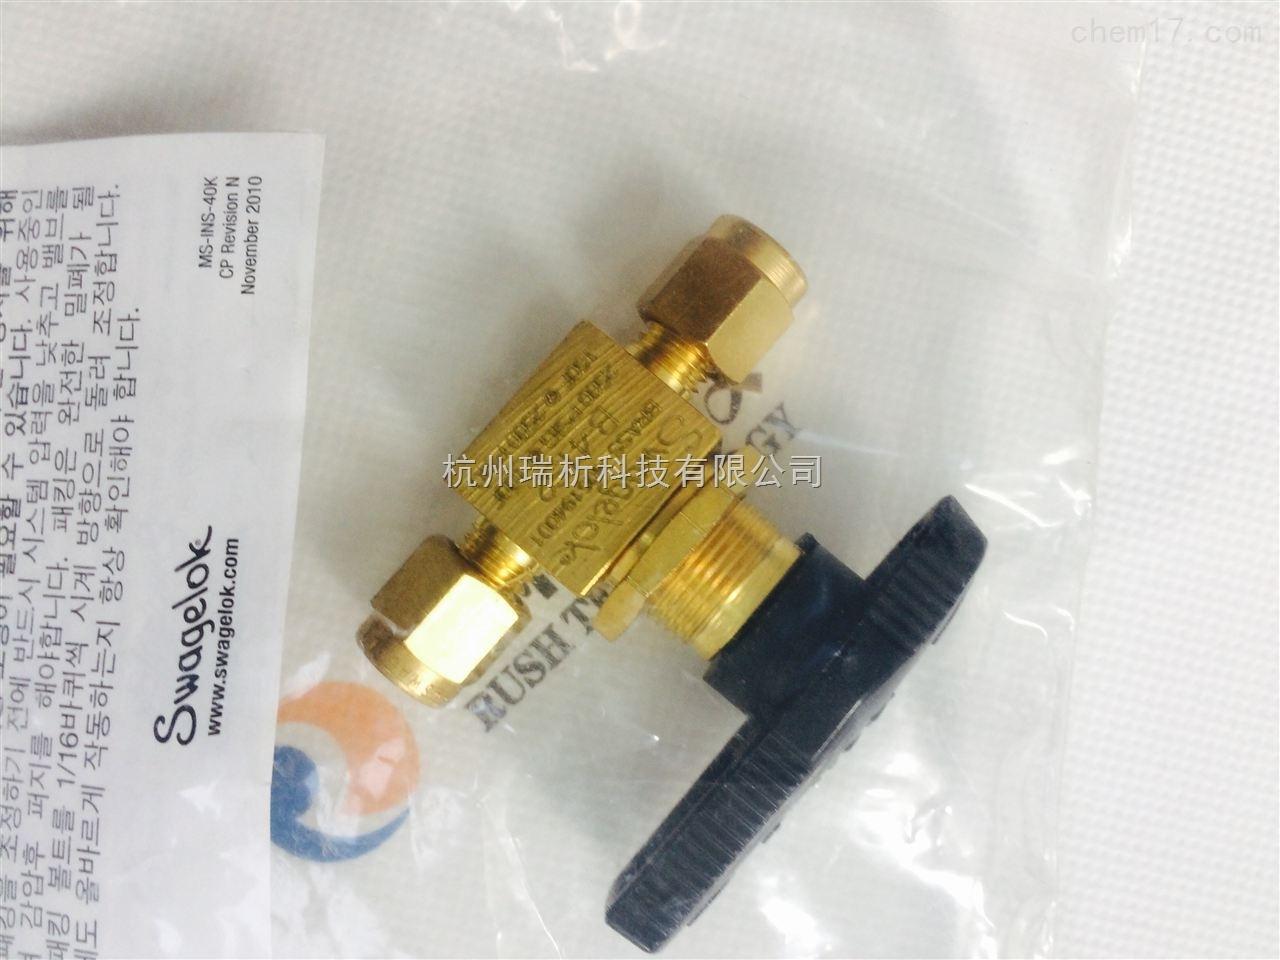 0100-2144Ball valve,0100-2144B all valve, 18 inch